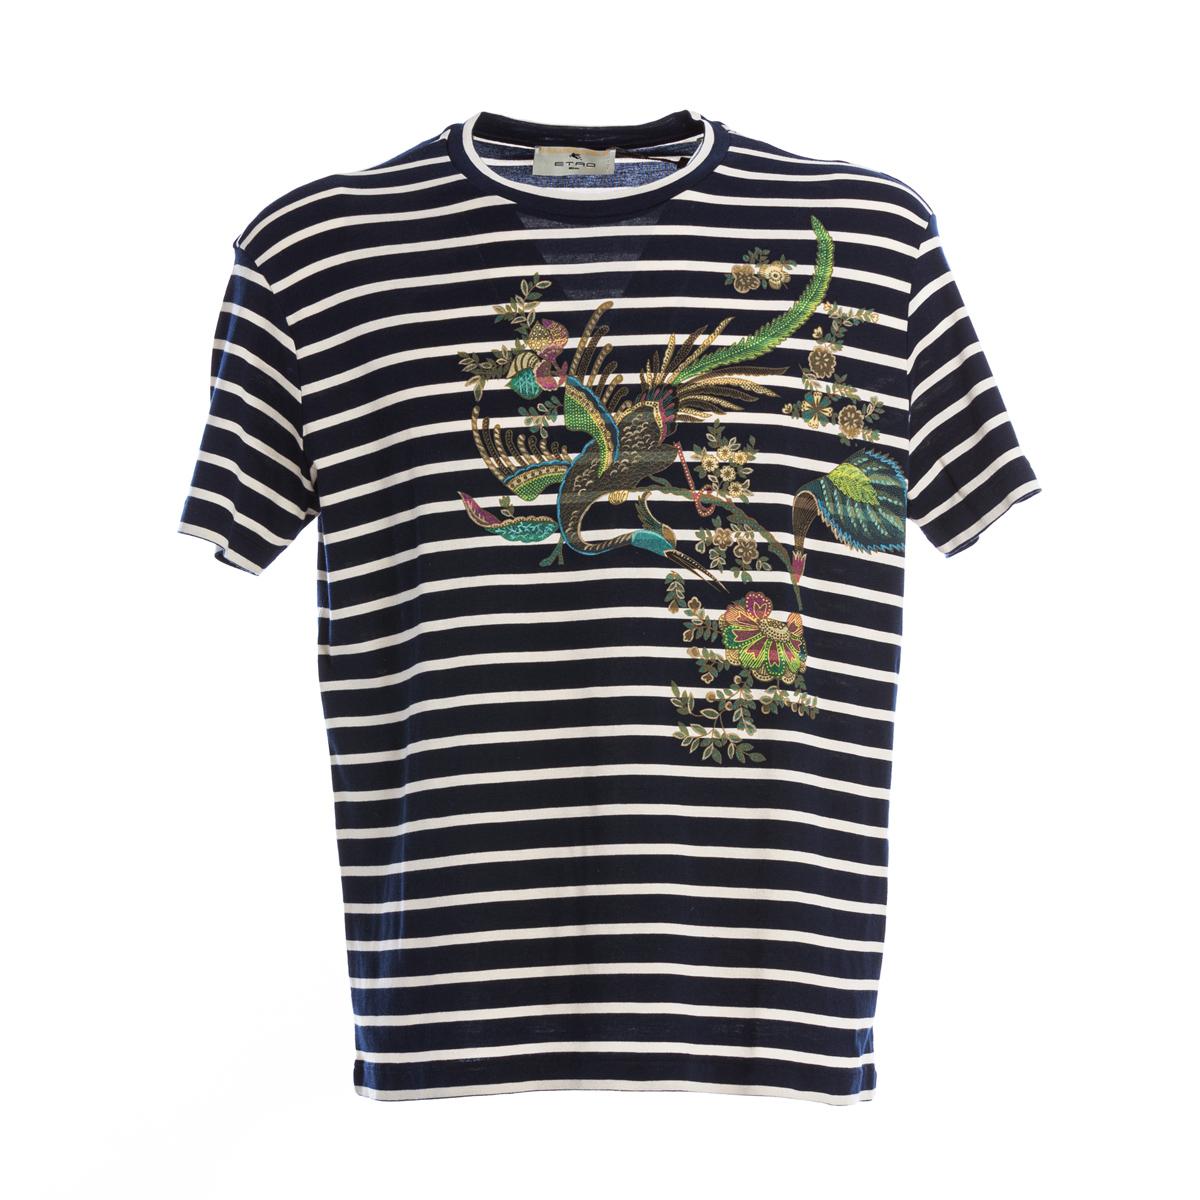 T-shirt Etro blu a righe bianche